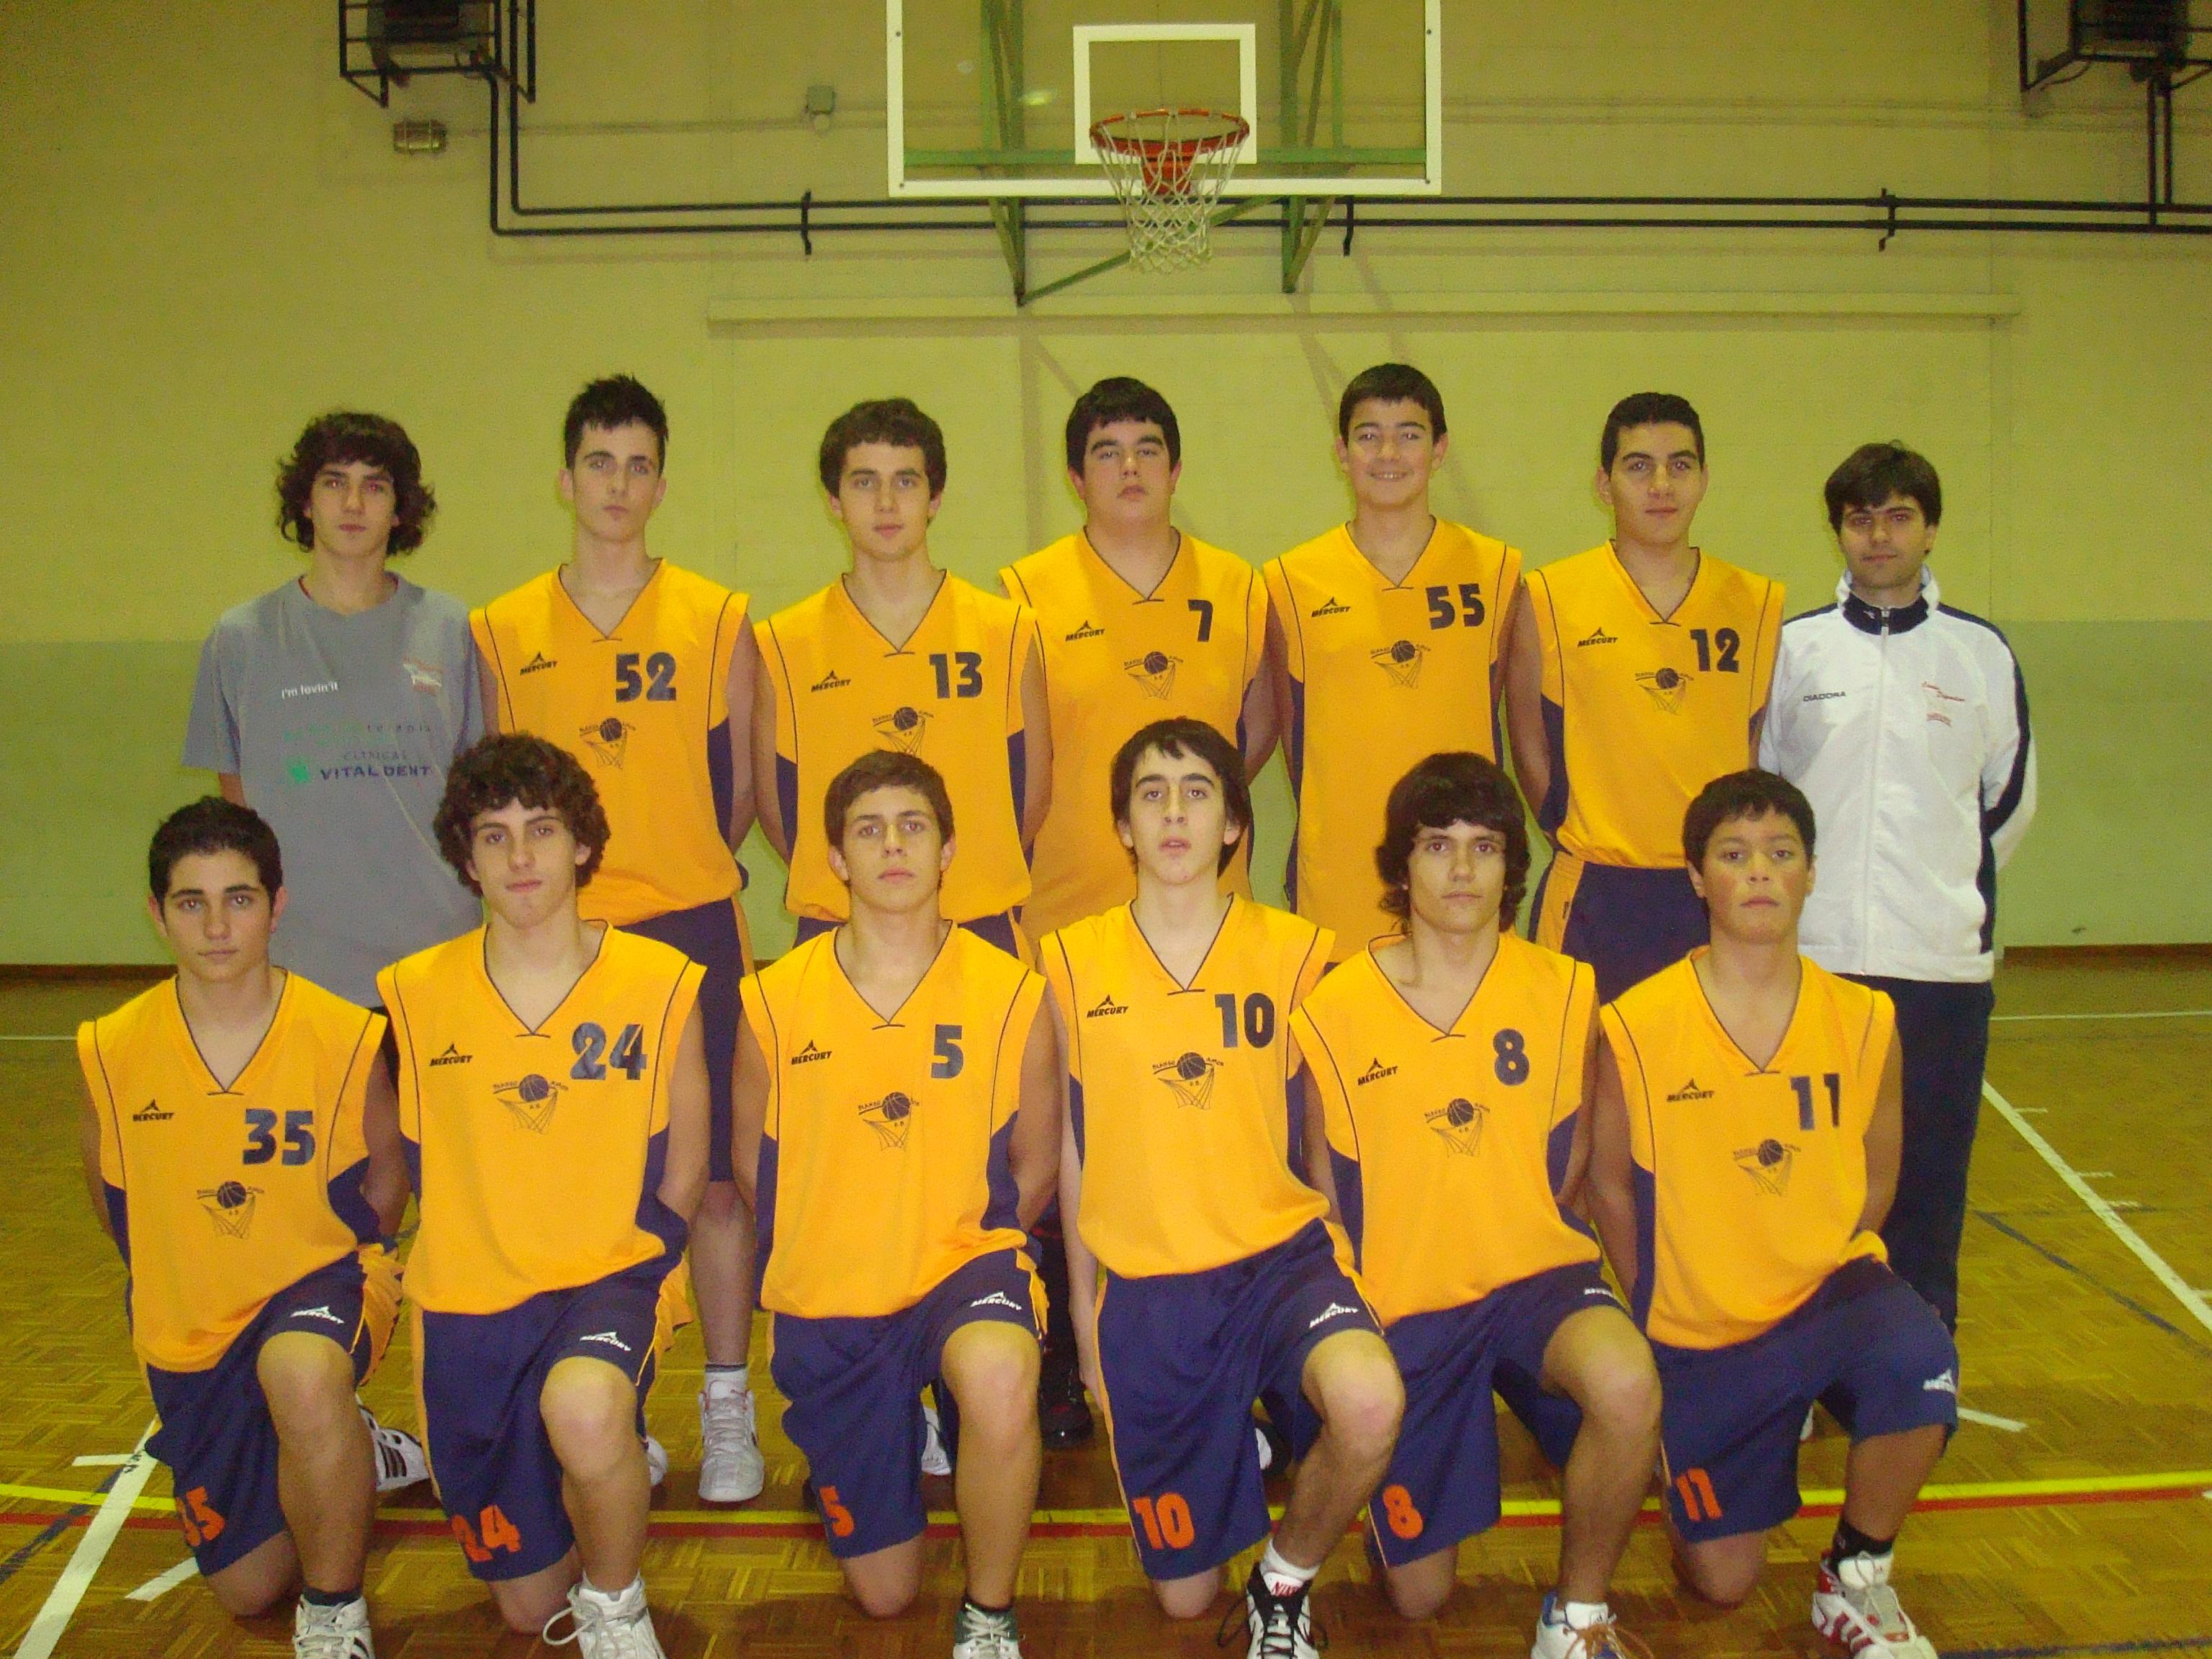 Baloncesto Ies Eduardo Blanco Amor